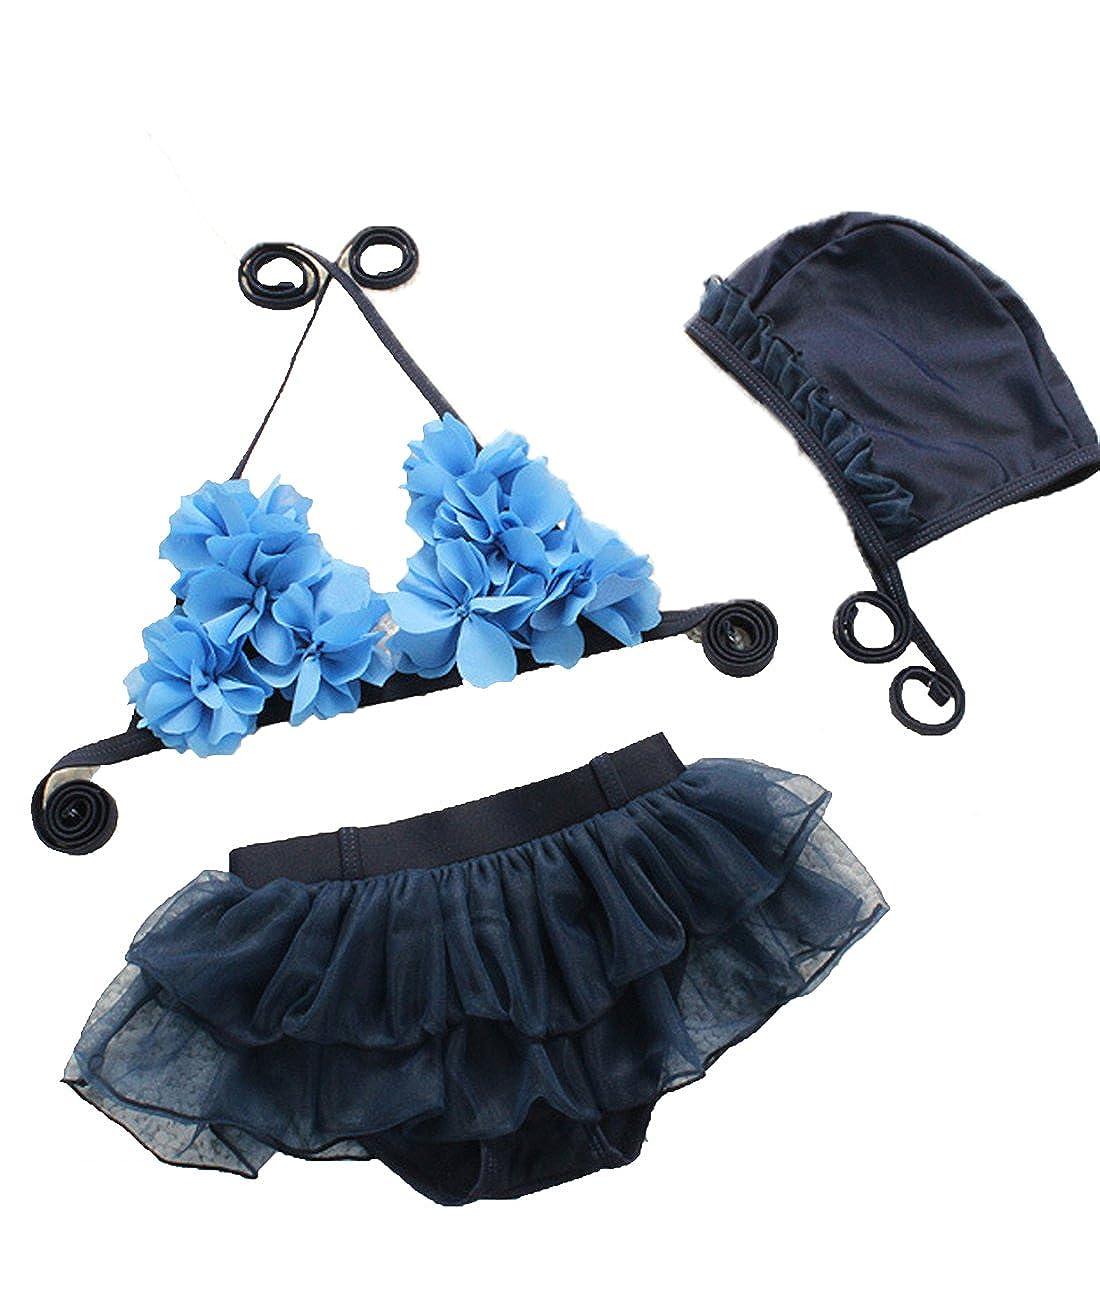 KJY Elegant 3 Peices Baby Girl Summer Bikini Sets Swimwear